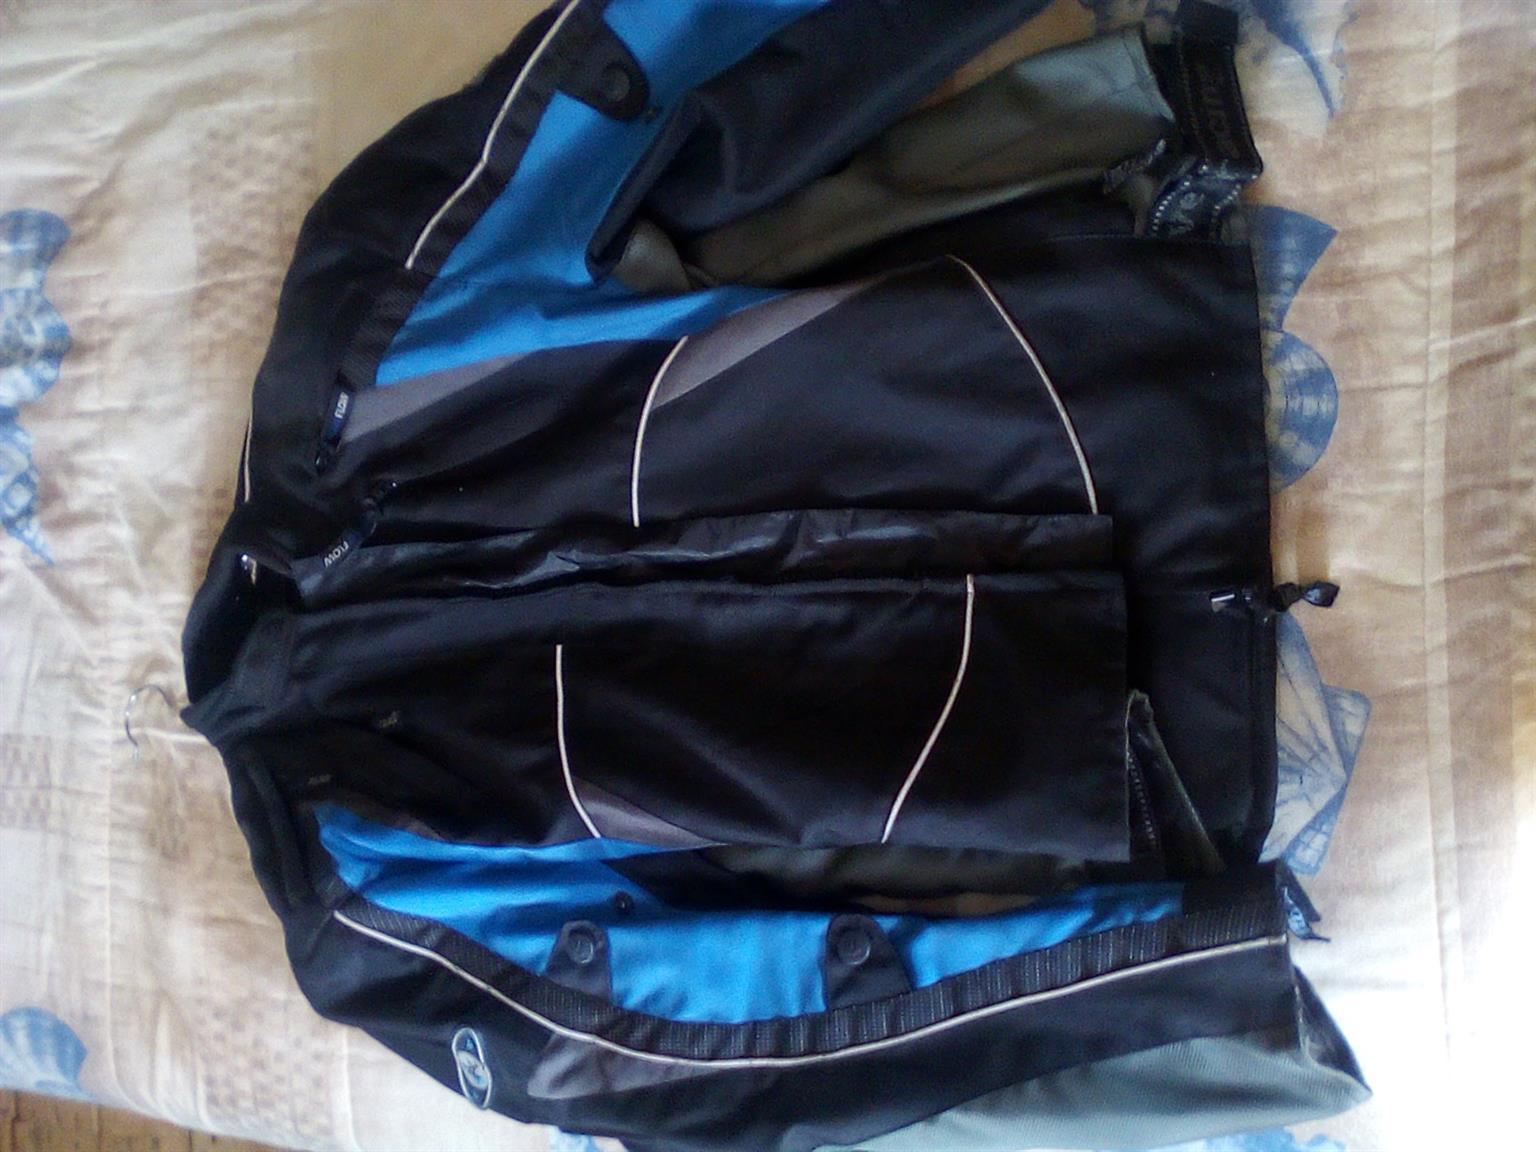 Biker gear and accessories